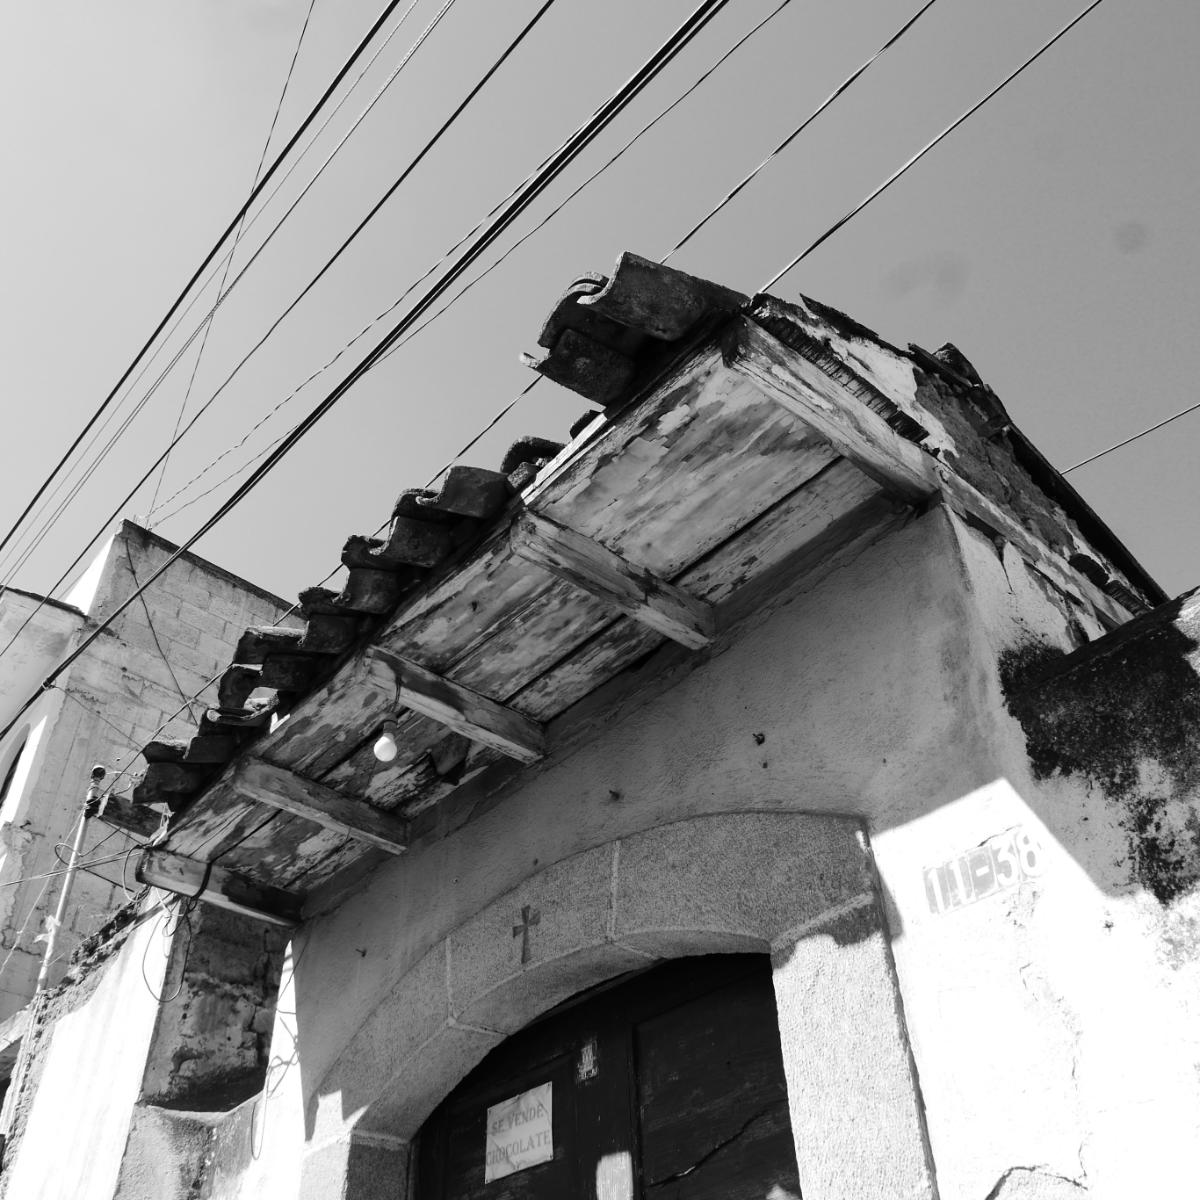 Damaged roof in Xela